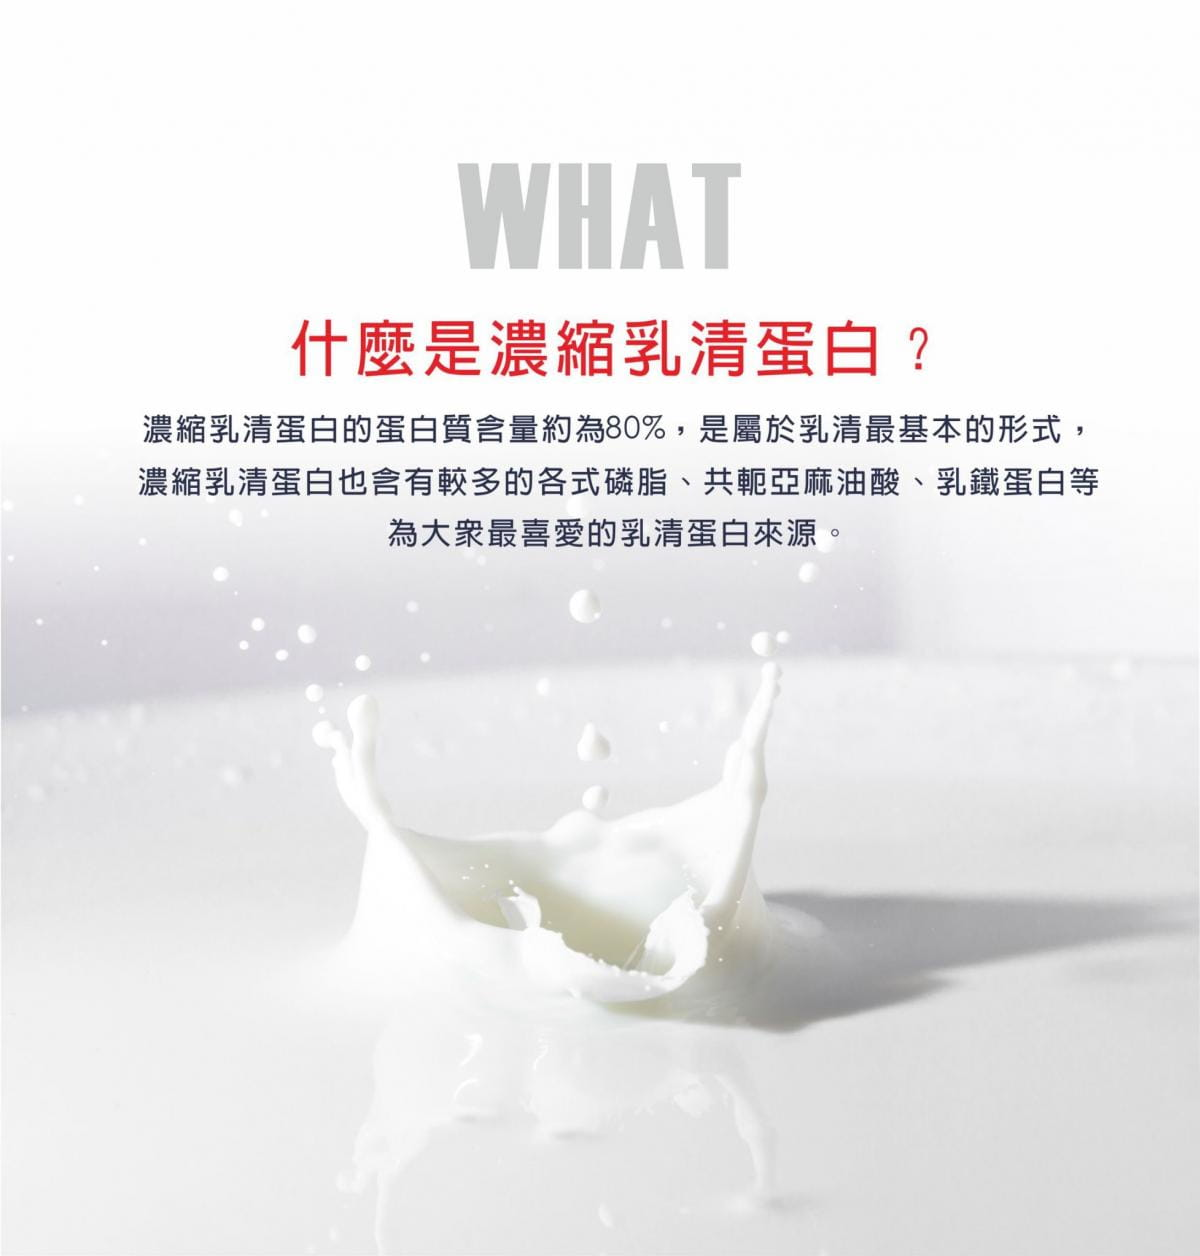 【LEXPORTS 勵動風潮】IS PROTEIN 乳清蛋白飲 - 單包裝(25g/包) 2